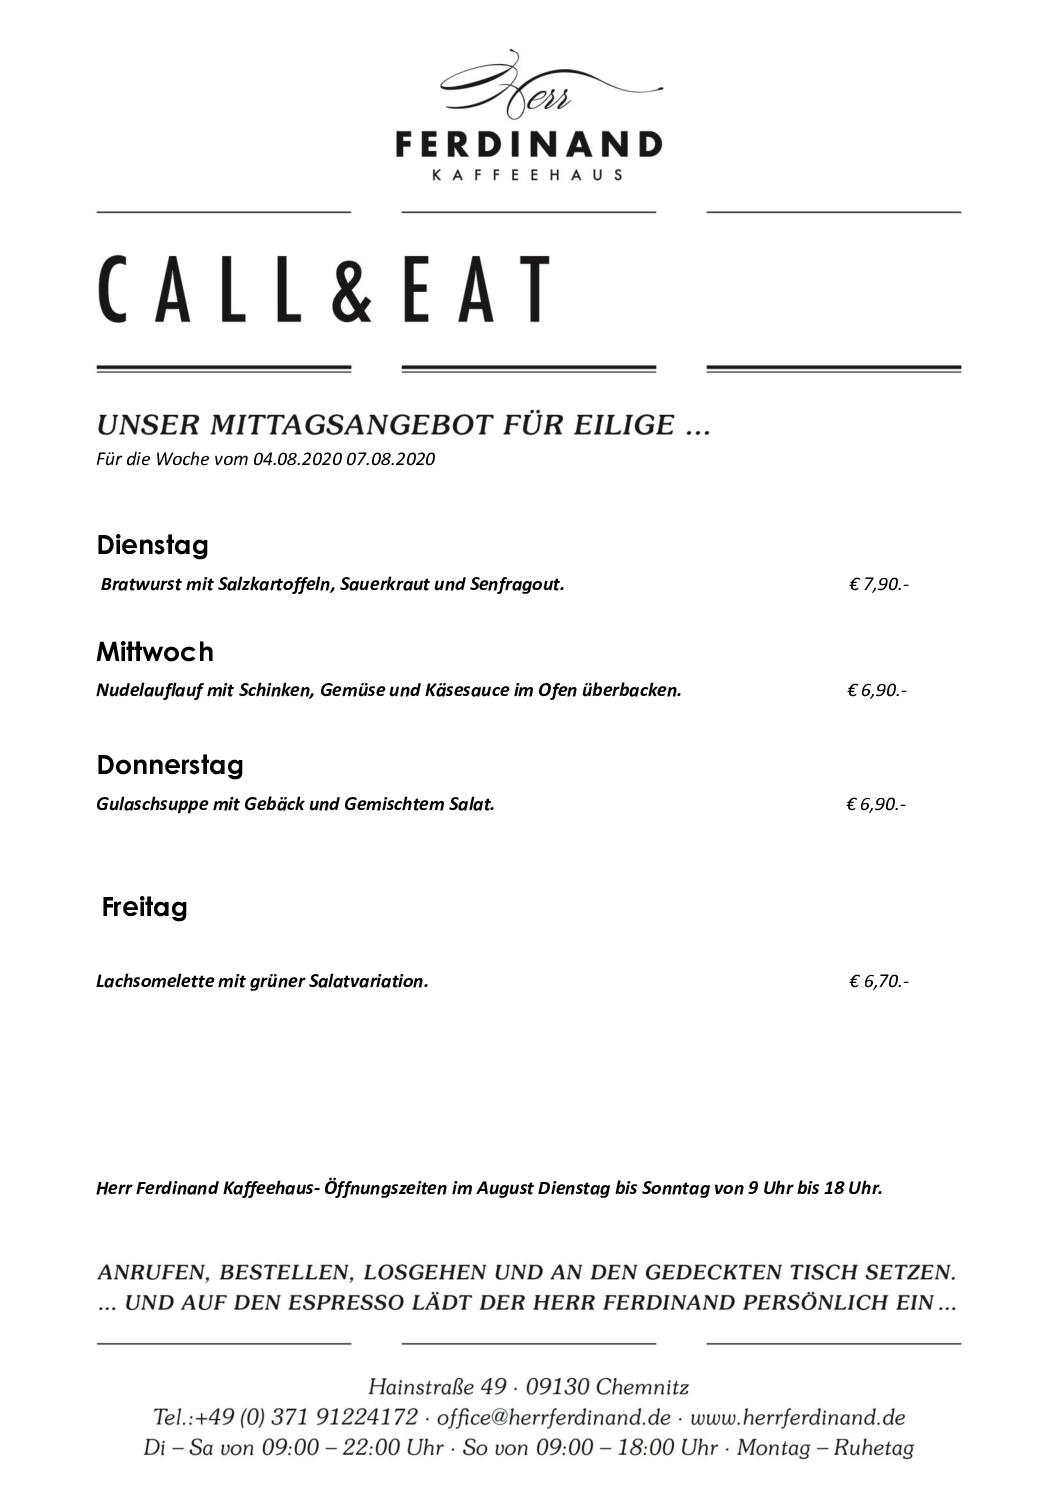 Vorlage_aktuell_Call Eat_20191017-5